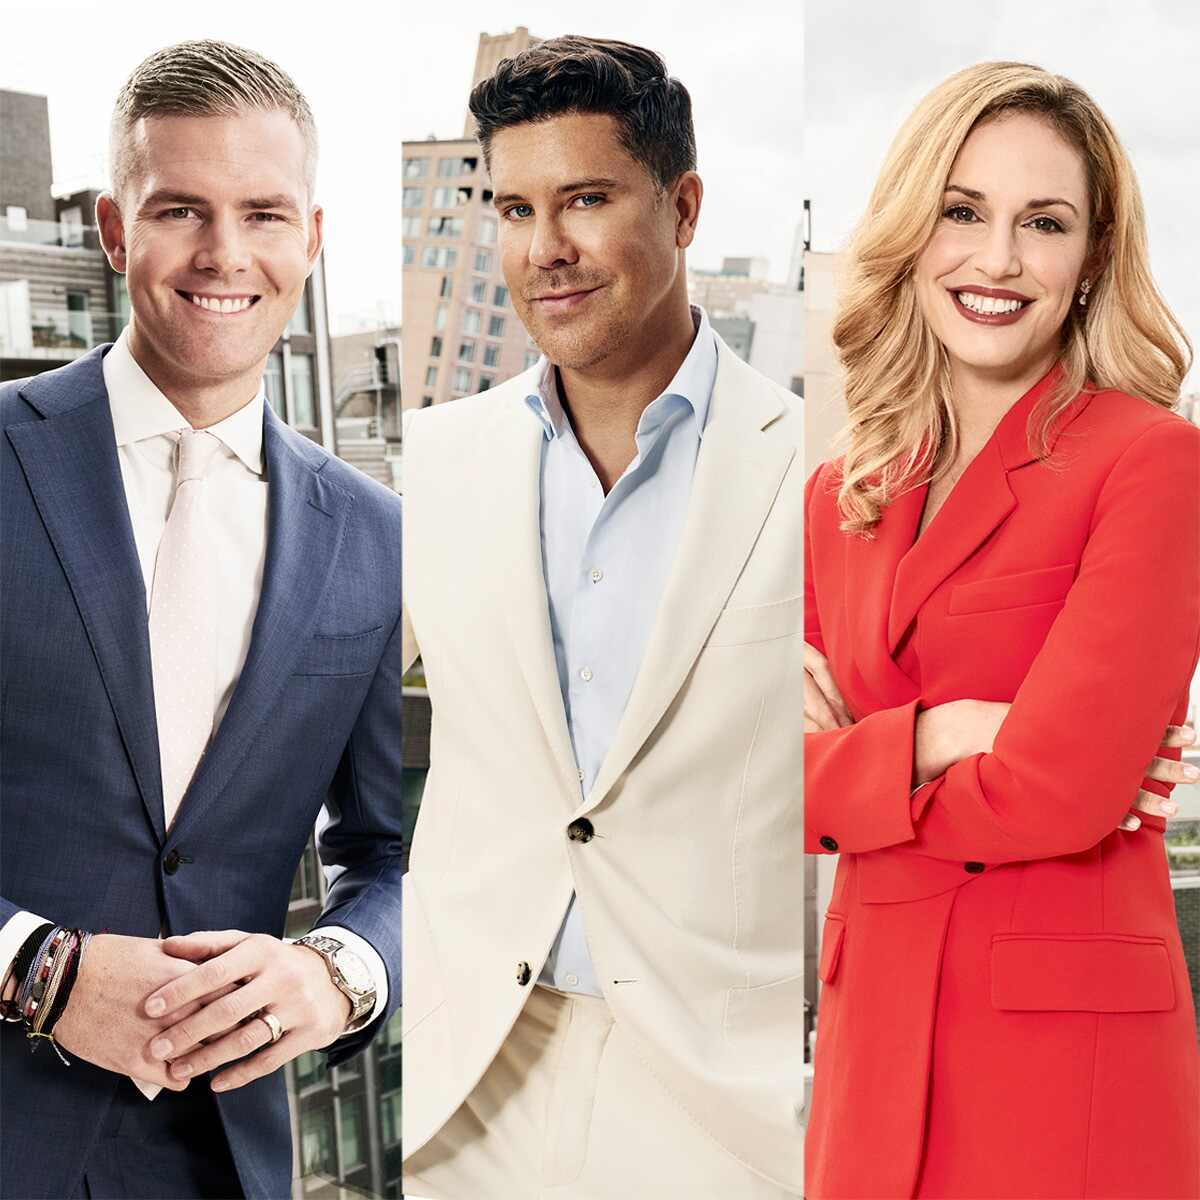 Million Dollar Listing, New York, Fredrik Eklund, Ryan Serhant, Kirsten Jordan